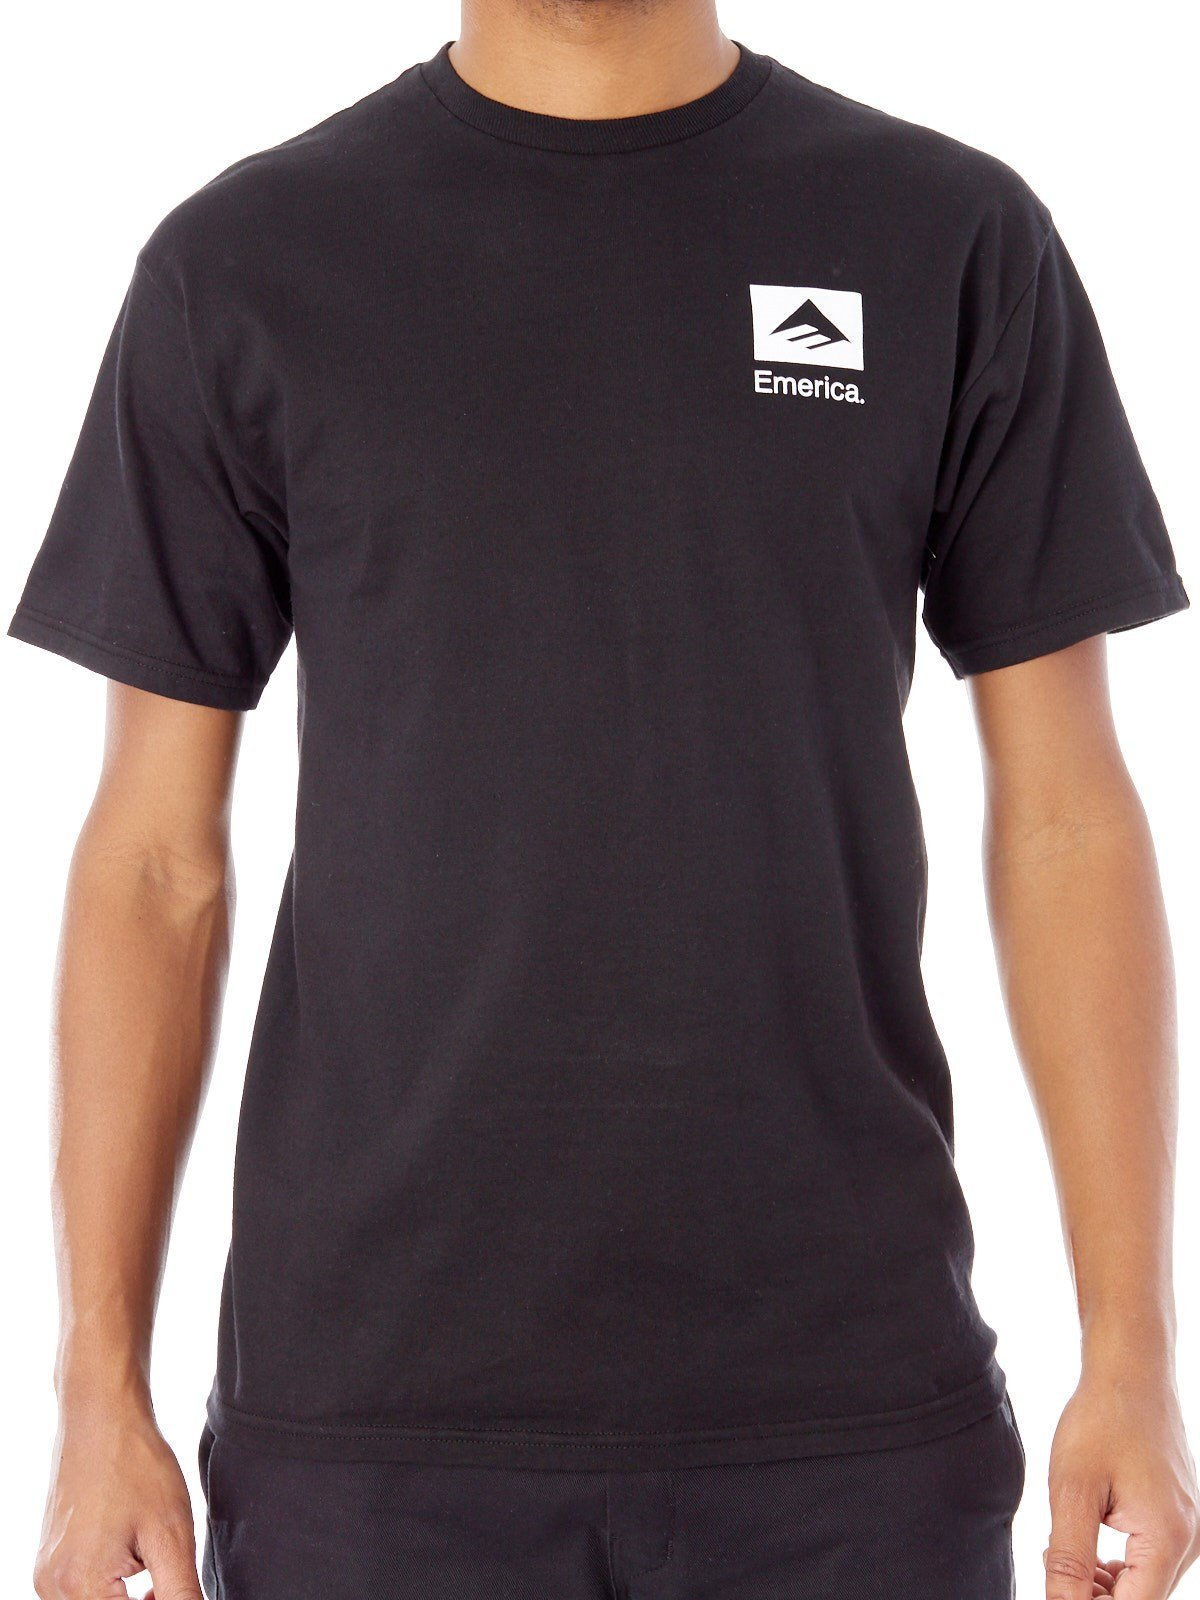 Emerica Mens Brand Combo Short Sleeve Shirts,Large,Black